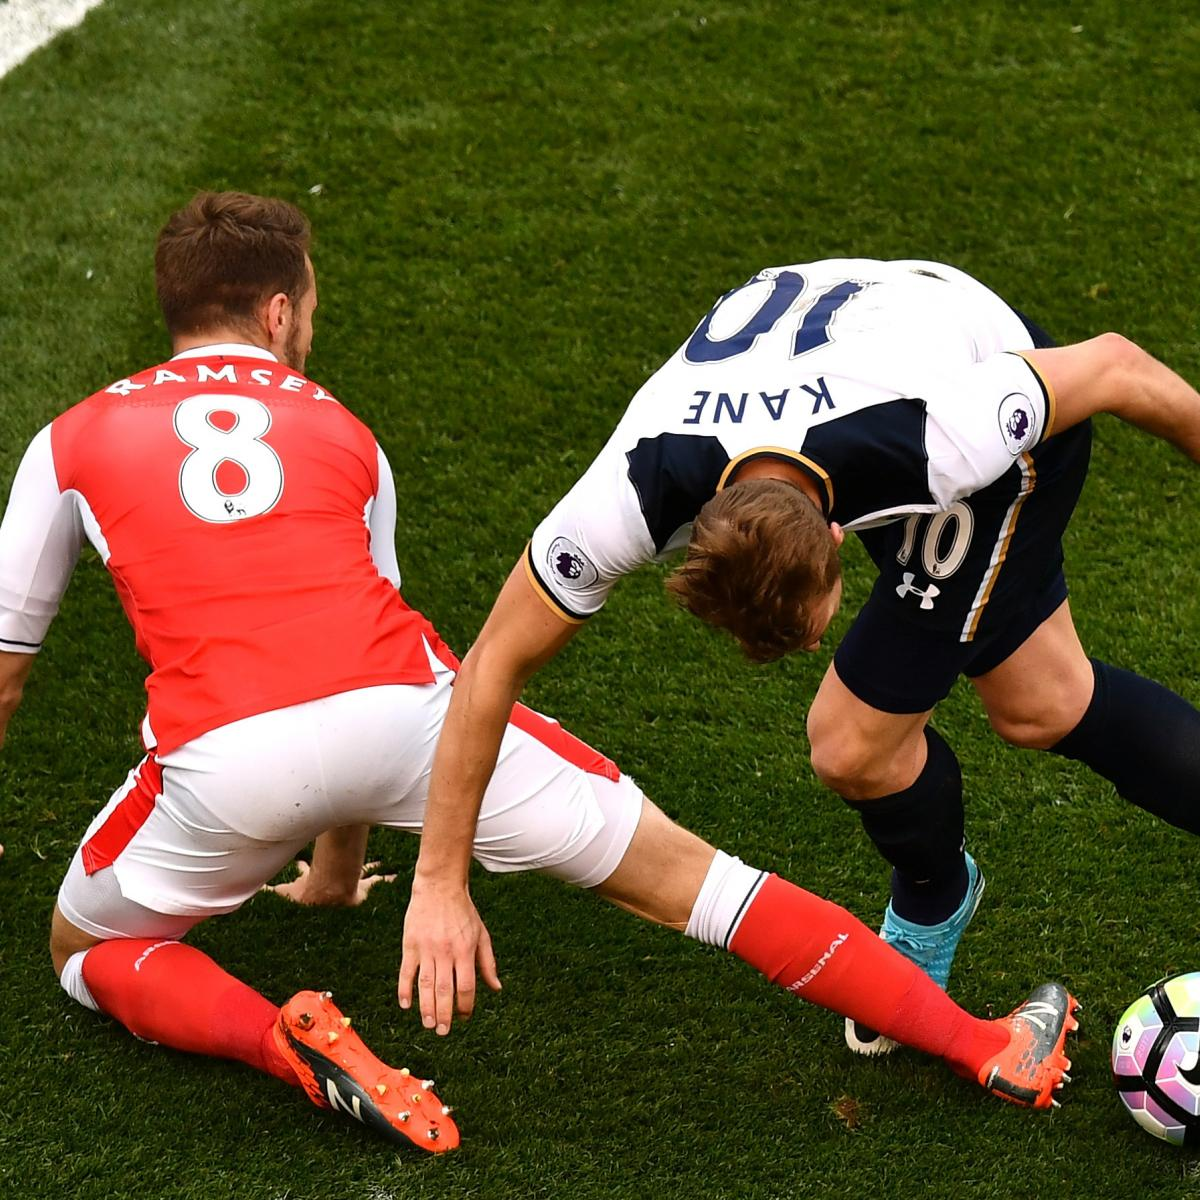 Tottenham 3 Fulham 1 Match Highlights Harry Kane Scores: Arsenal Vs. Tottenham: Combined XI On Form This Season